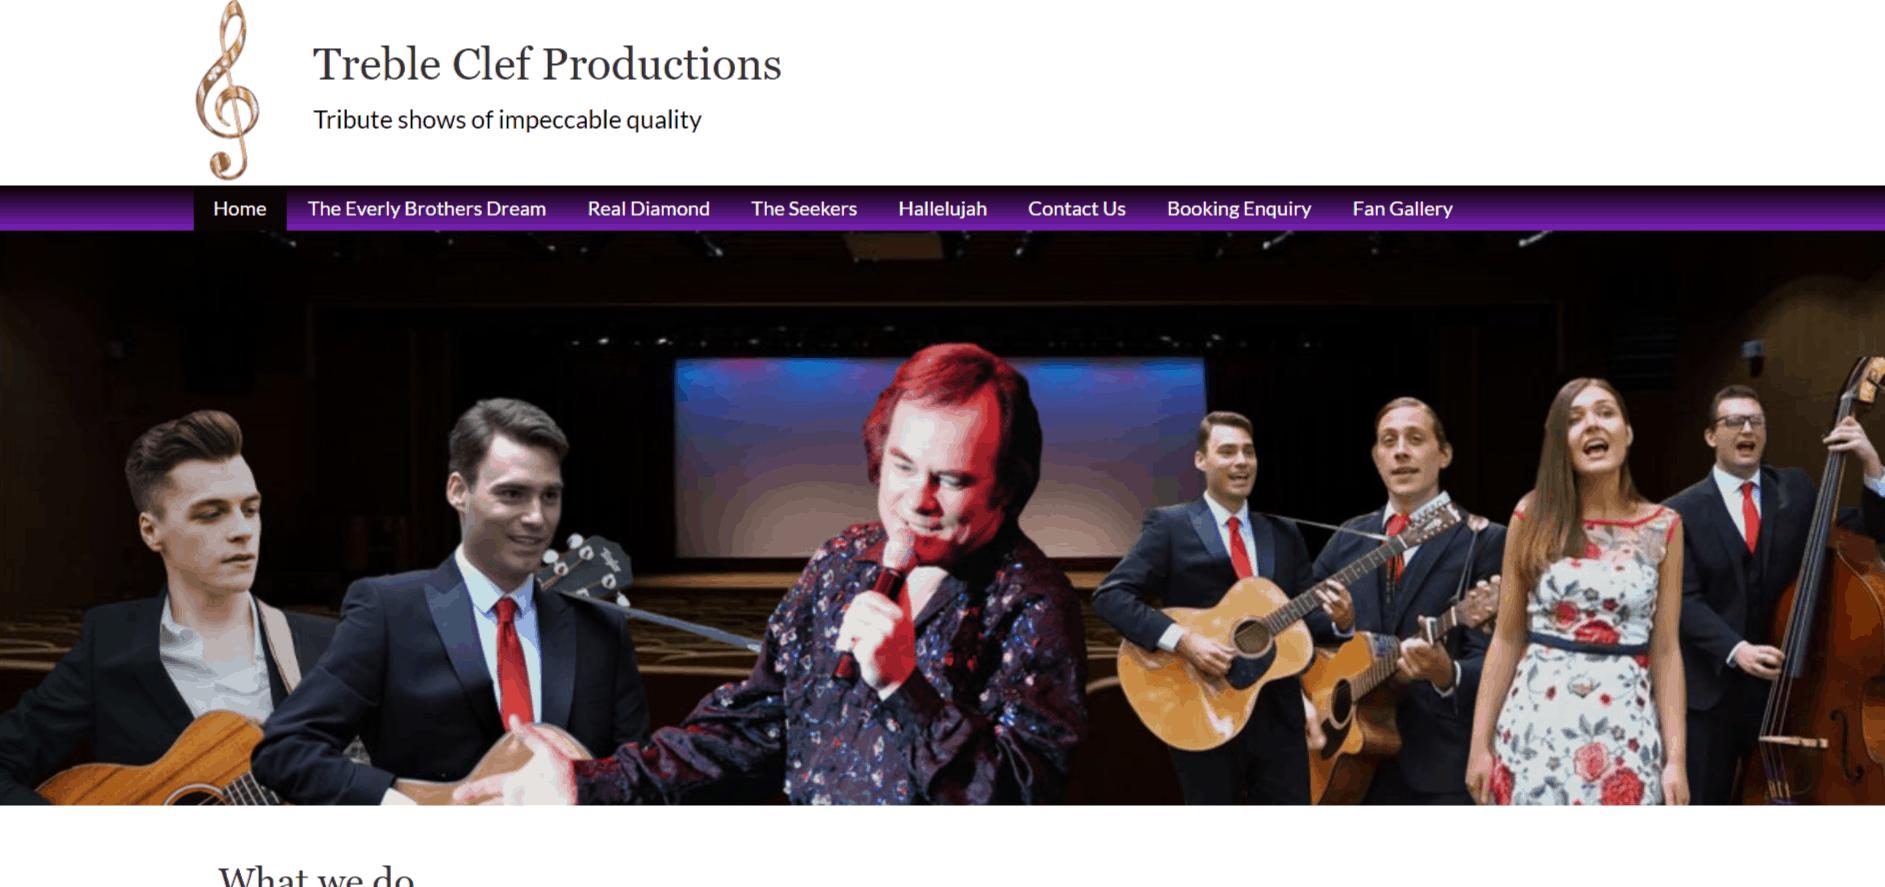 Treble Clef Productions